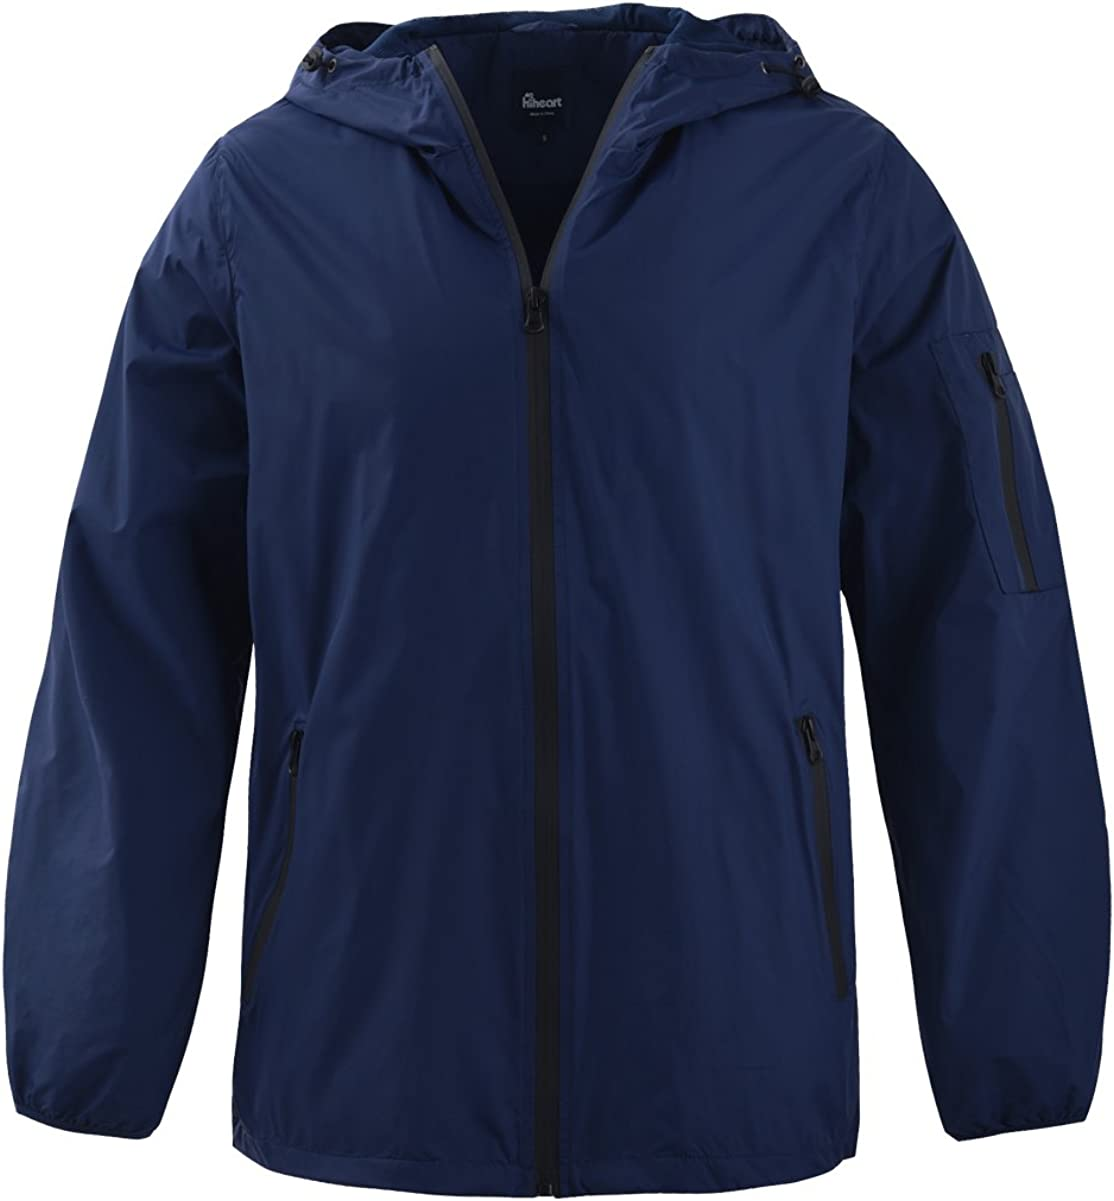 Hiheart Mens Outdoor Waterproof Mesh lined Runnning Jacket with Hood